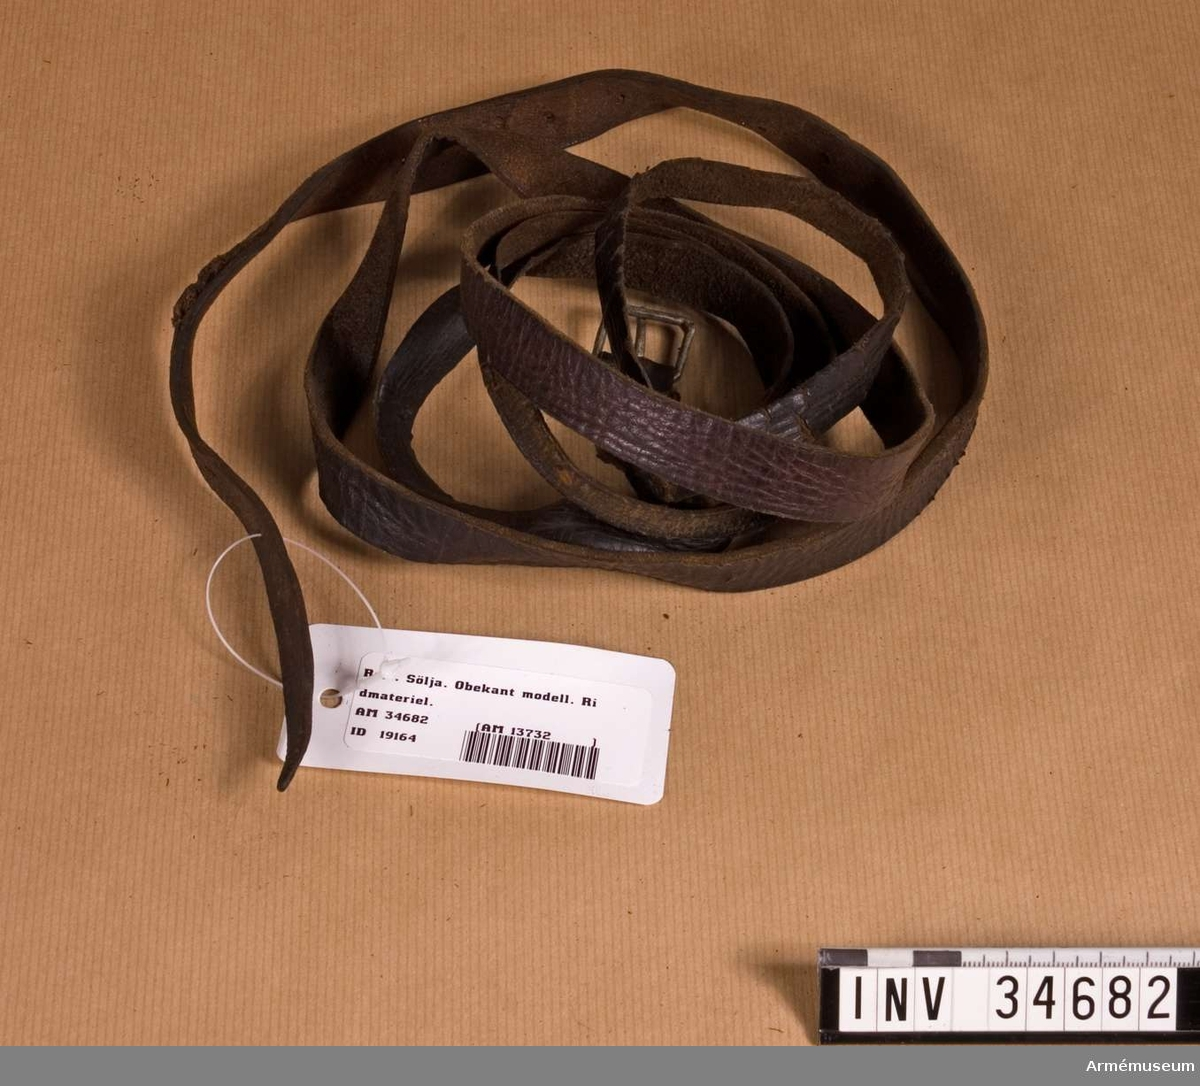 Samhörande gåva: 34682-91, remmar. Rem med sölja. Grupp K I. Obekant modell.